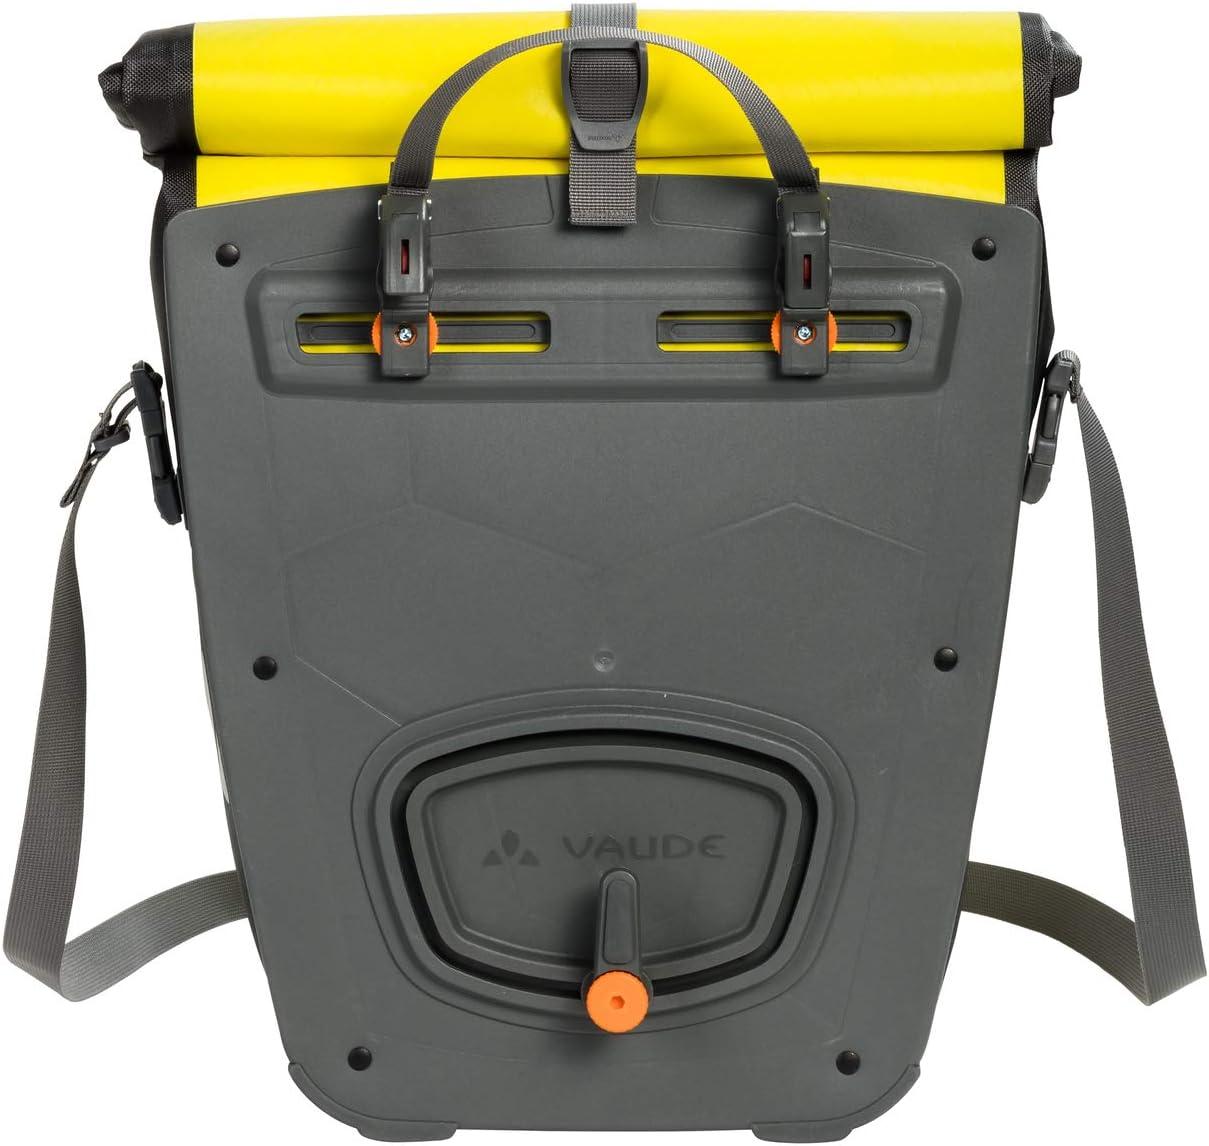 VAUDE Aqua Back Hinterradtasche